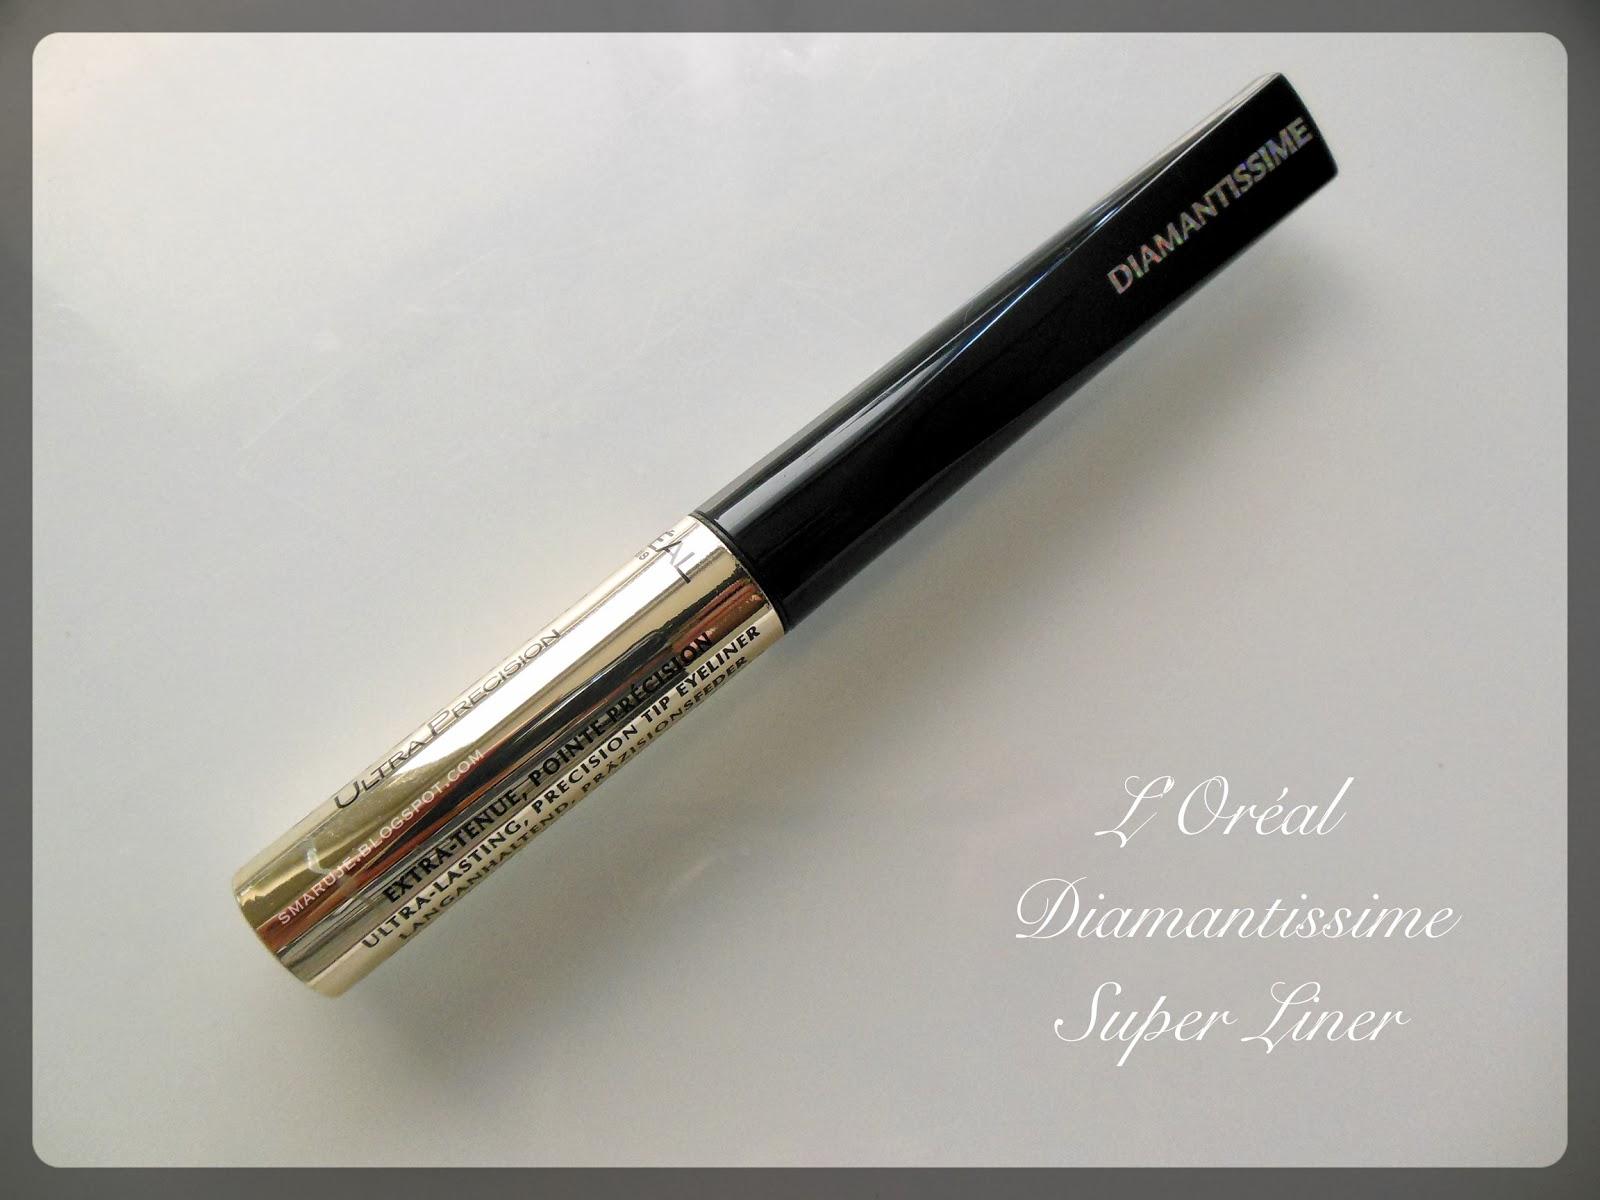 L'Oréal – Super Liner Diamantissime [recenzja]